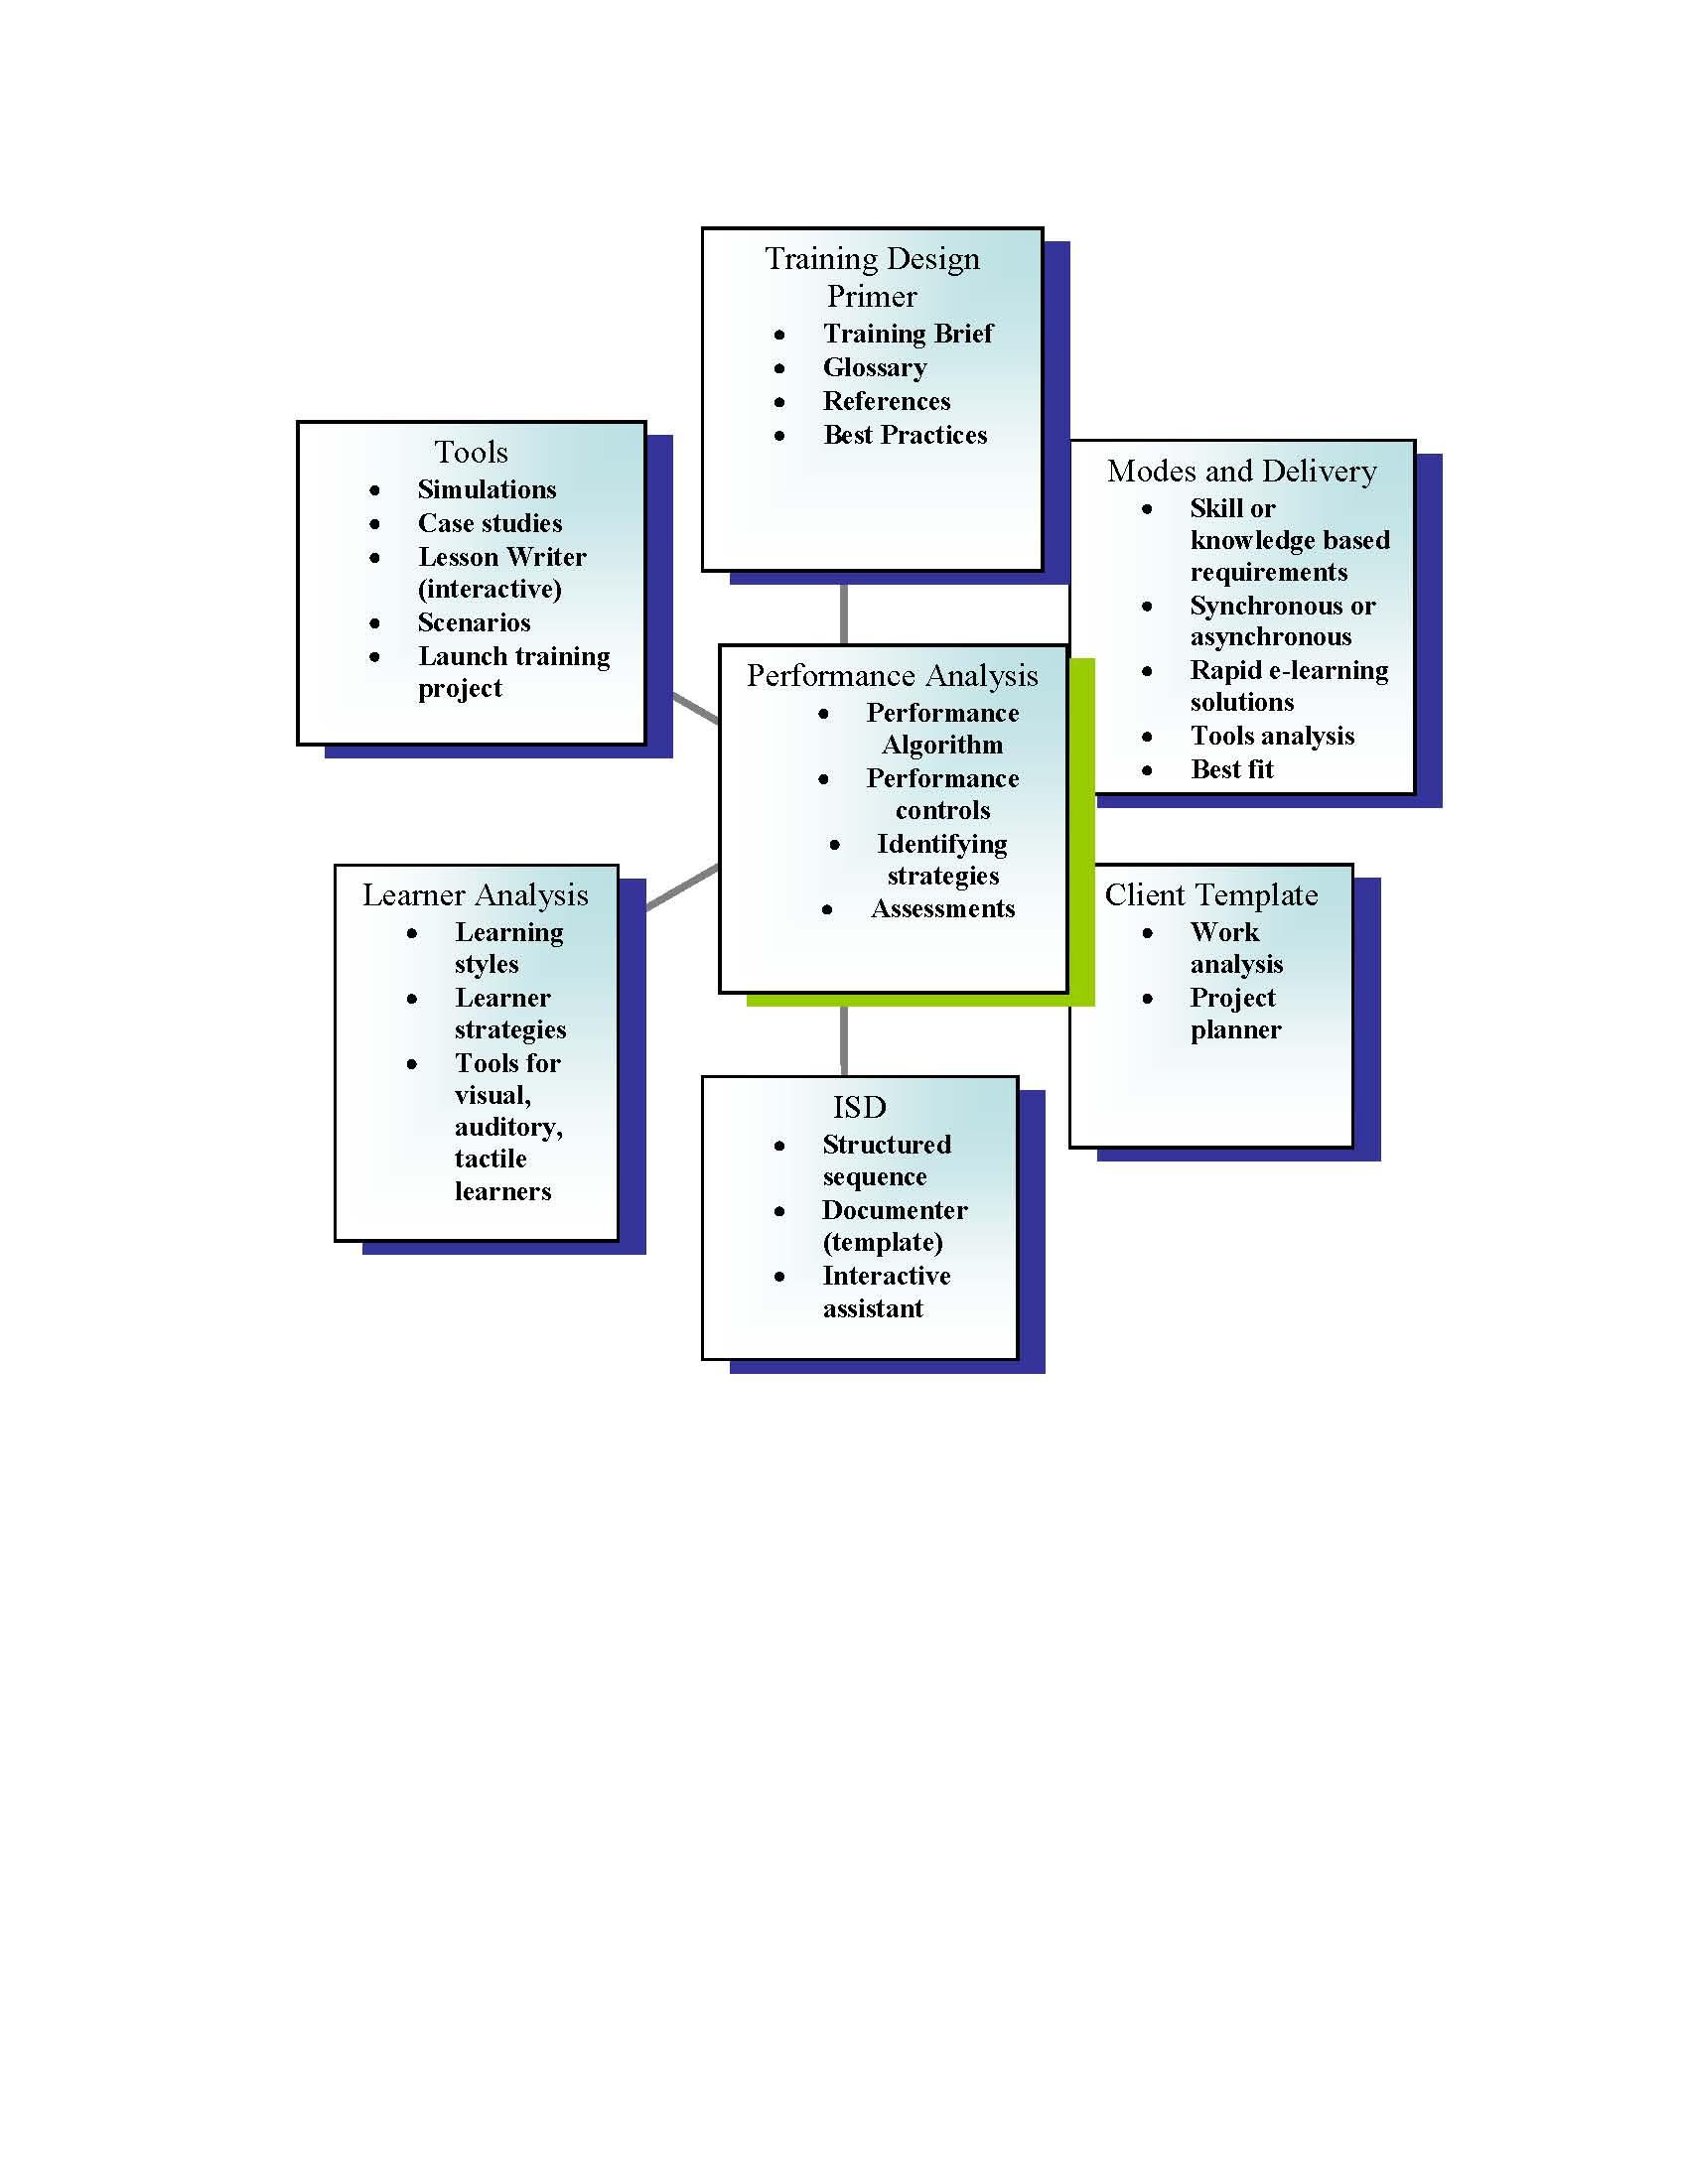 Attachment Flow_diagram.jpg